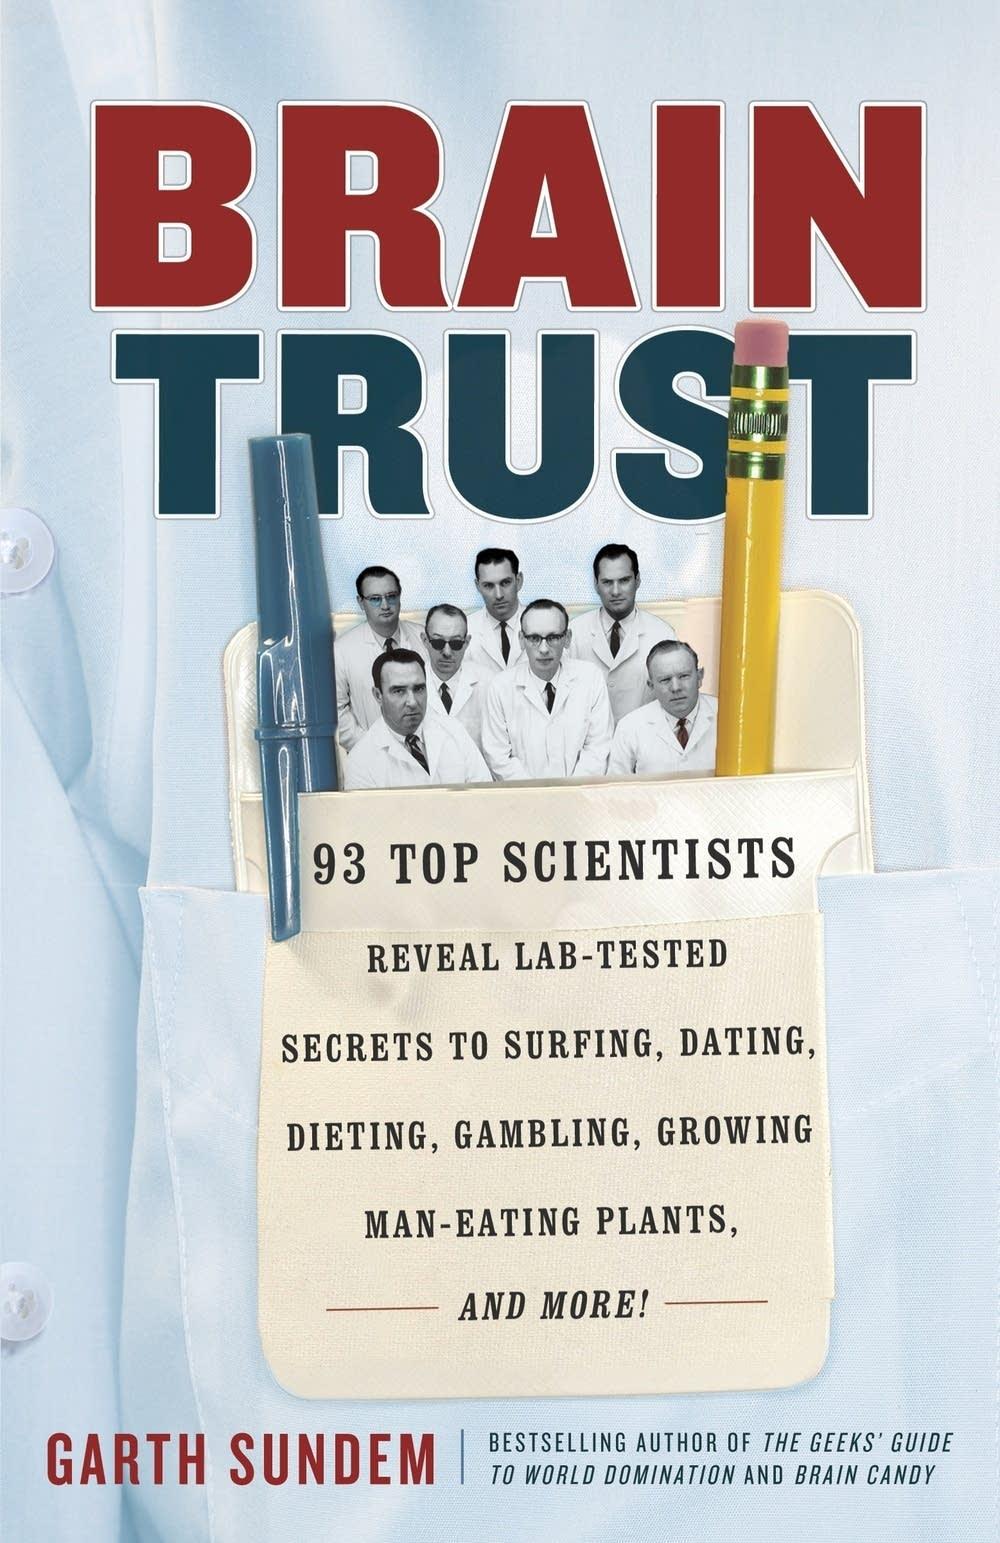 'Brain Trust' by Garth Sundem